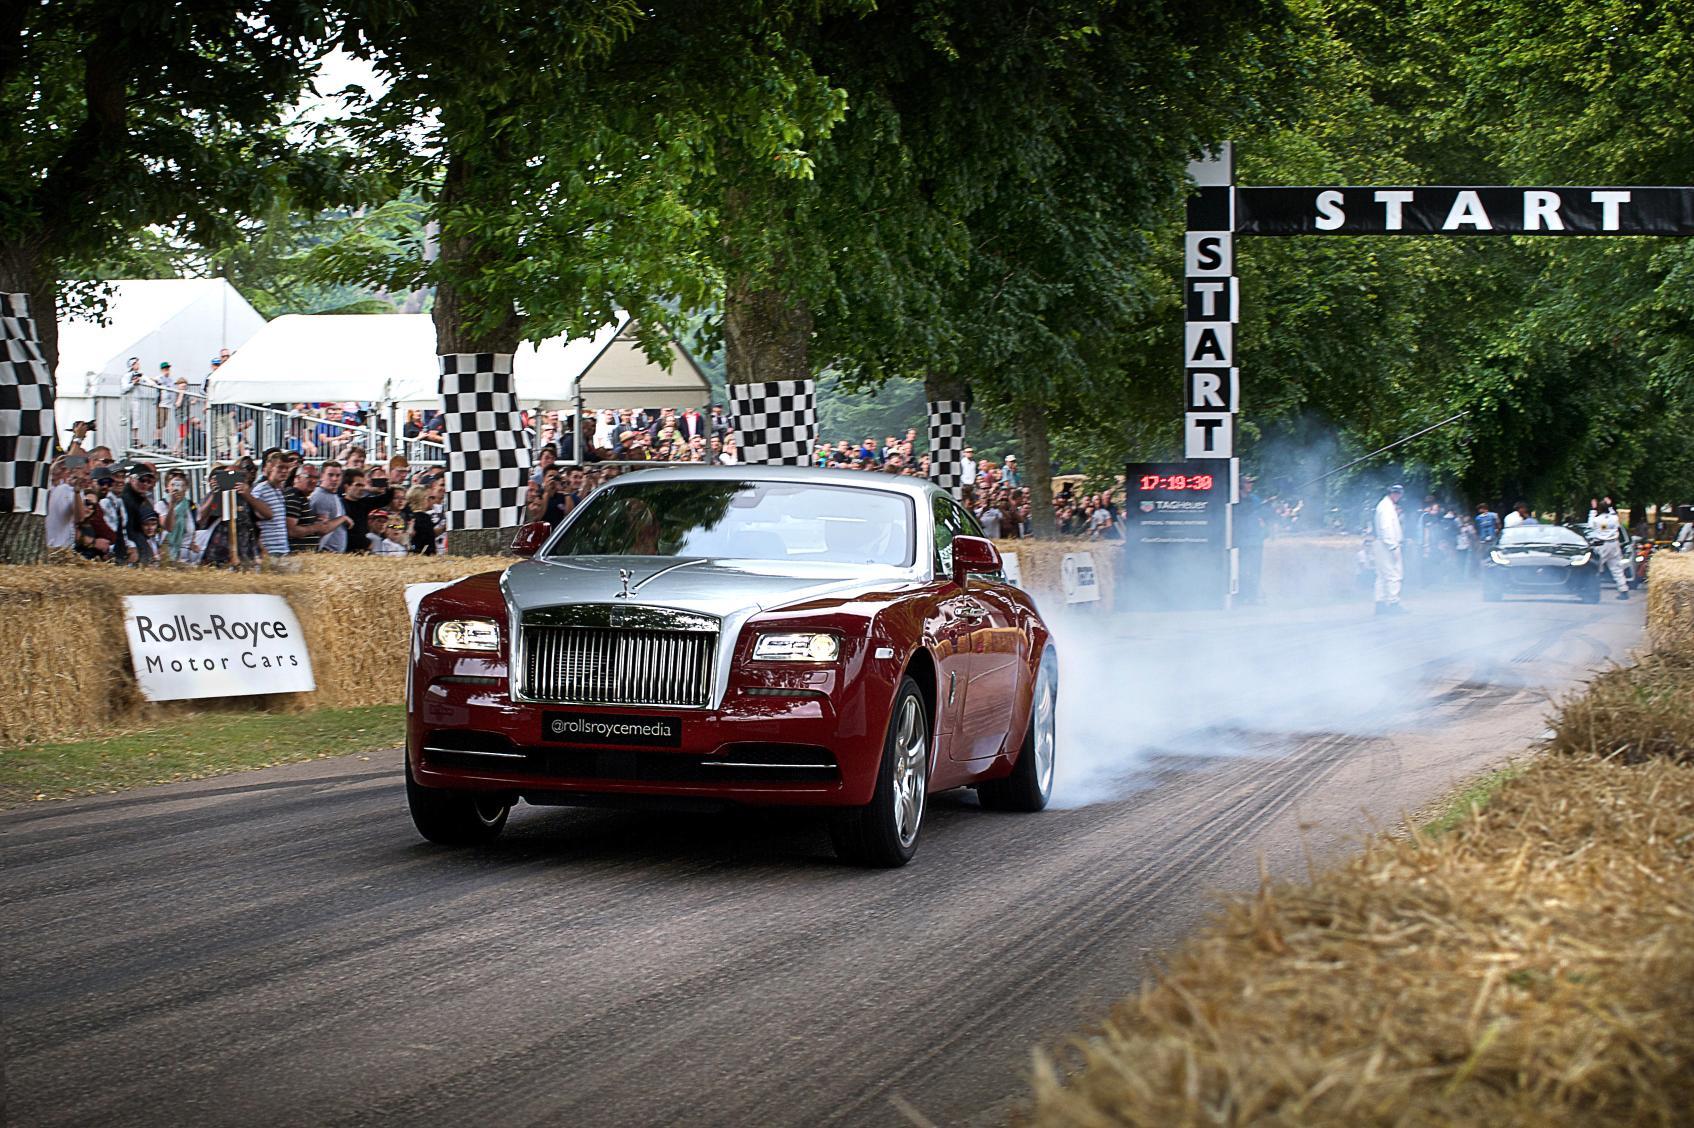 Goodwood Rolls Royce